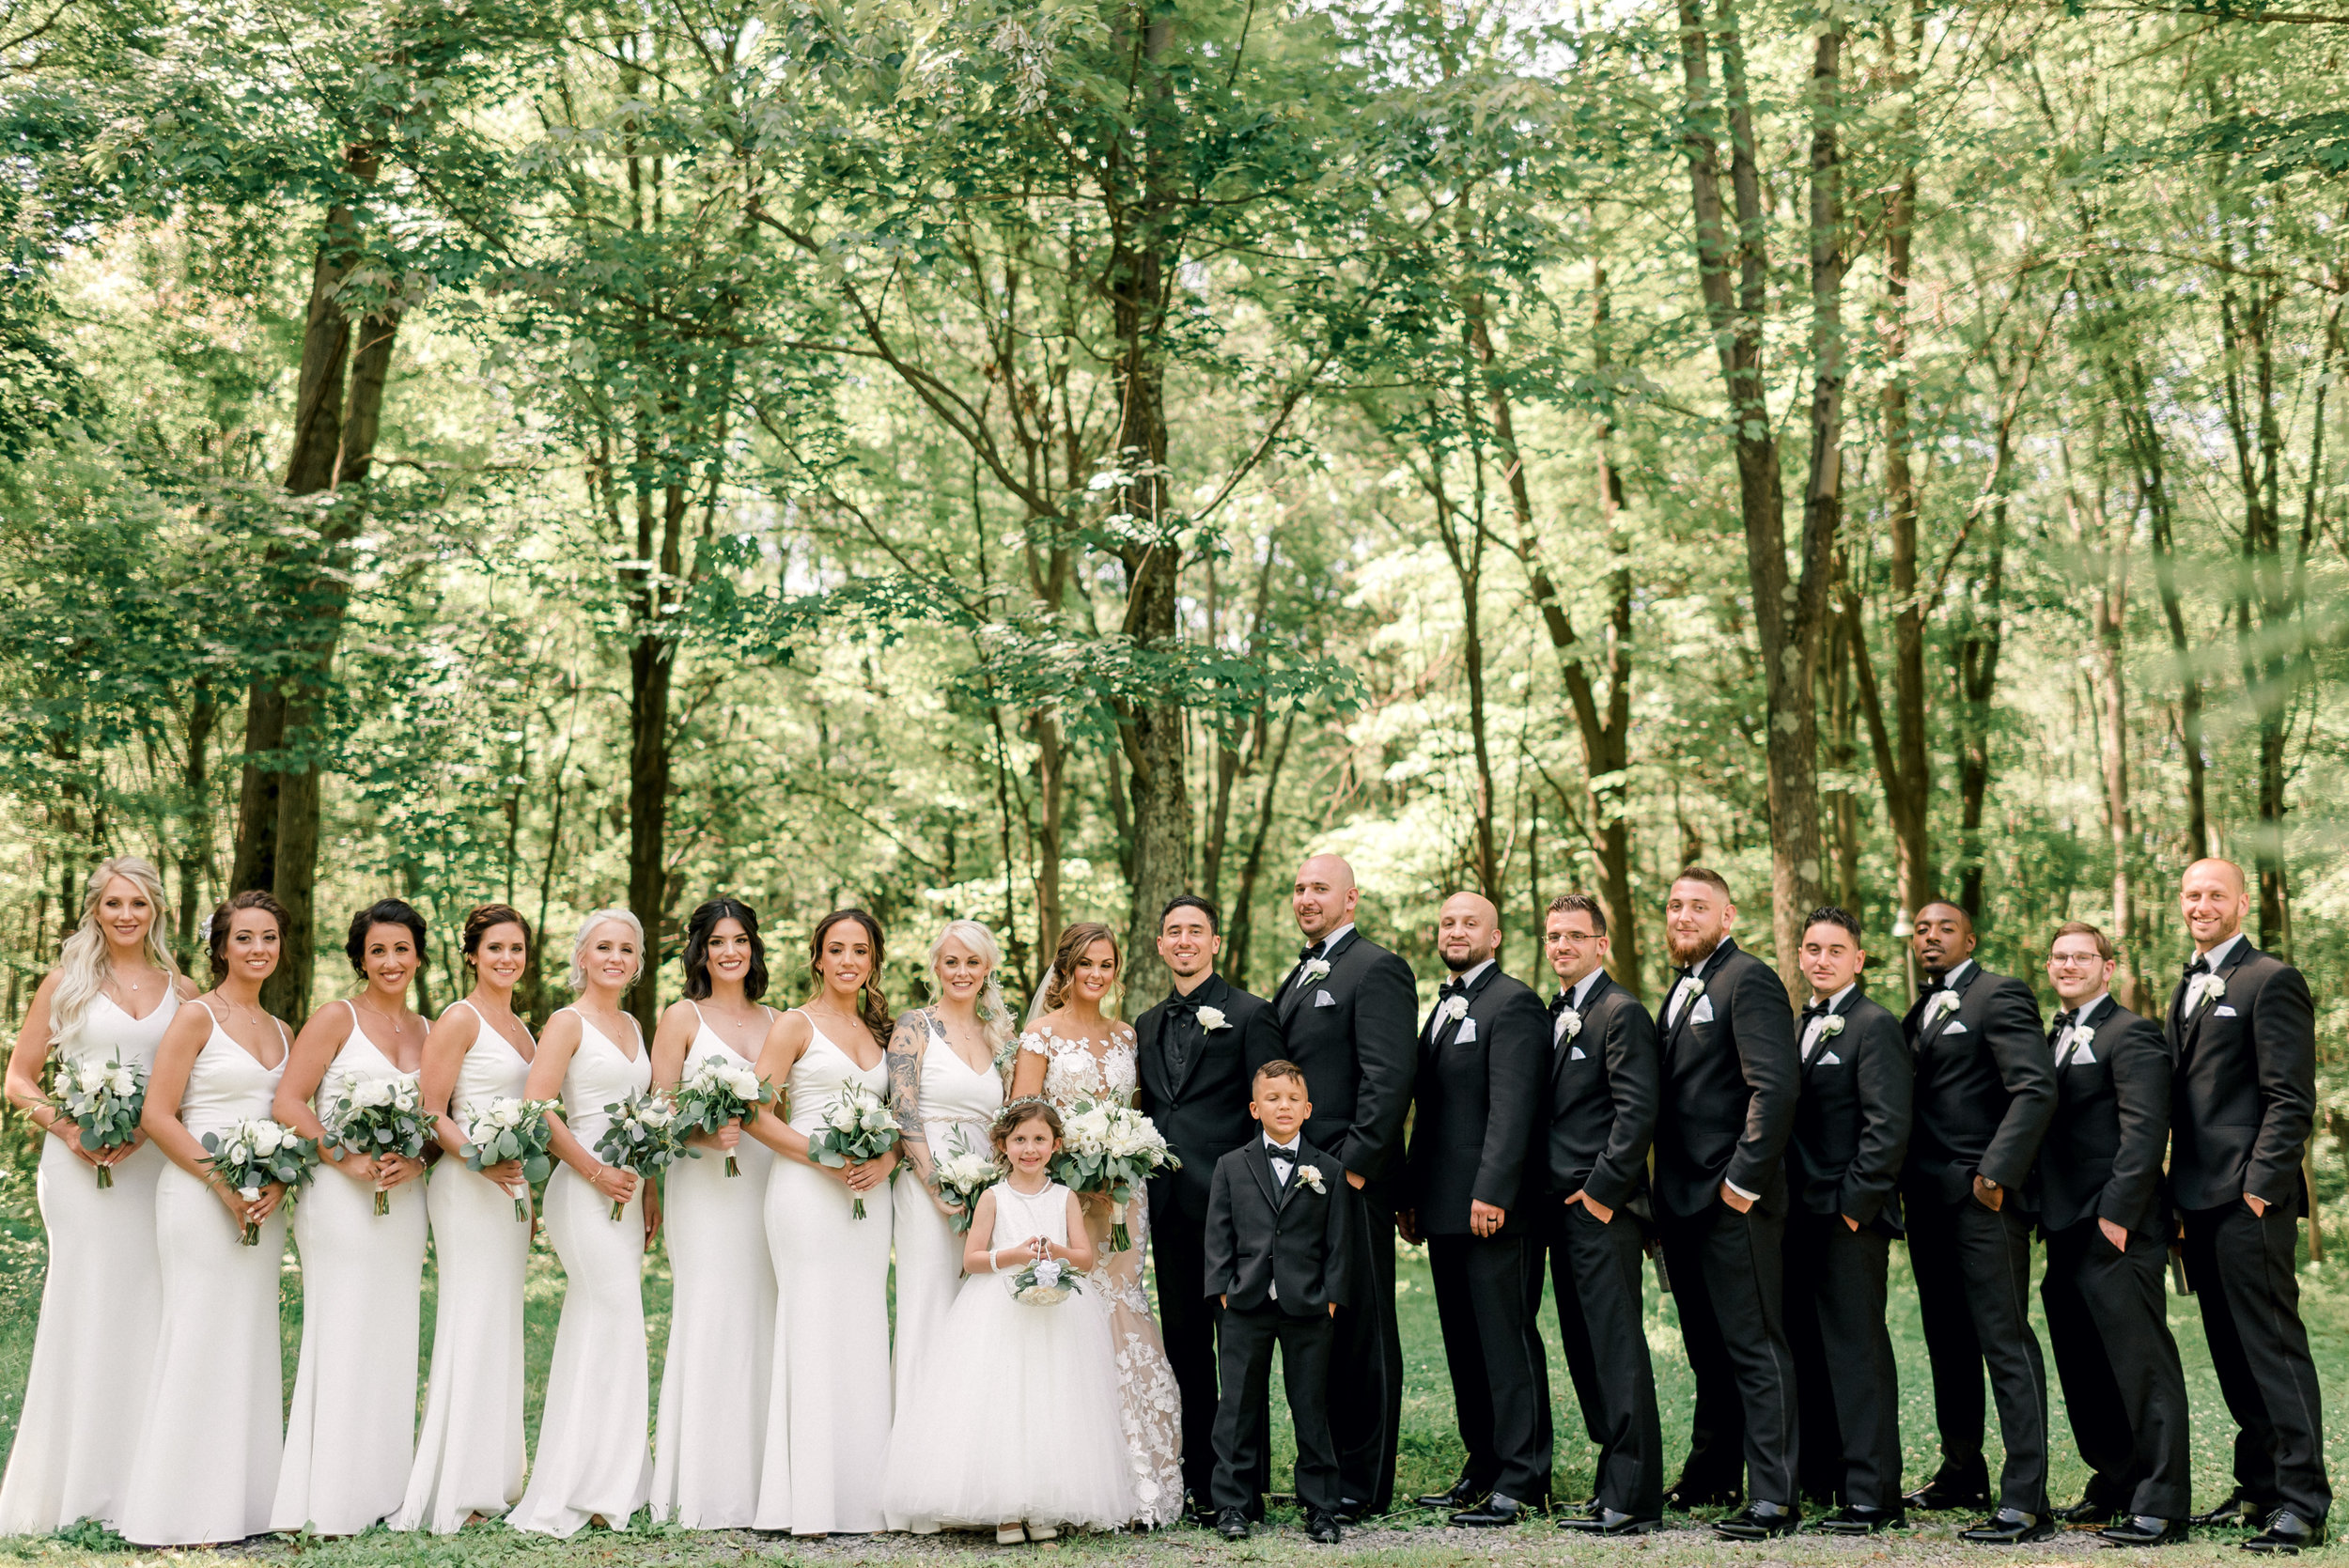 pittsburgh-wedding-photographer-grand-estate-hidden-acres-0025.jpg